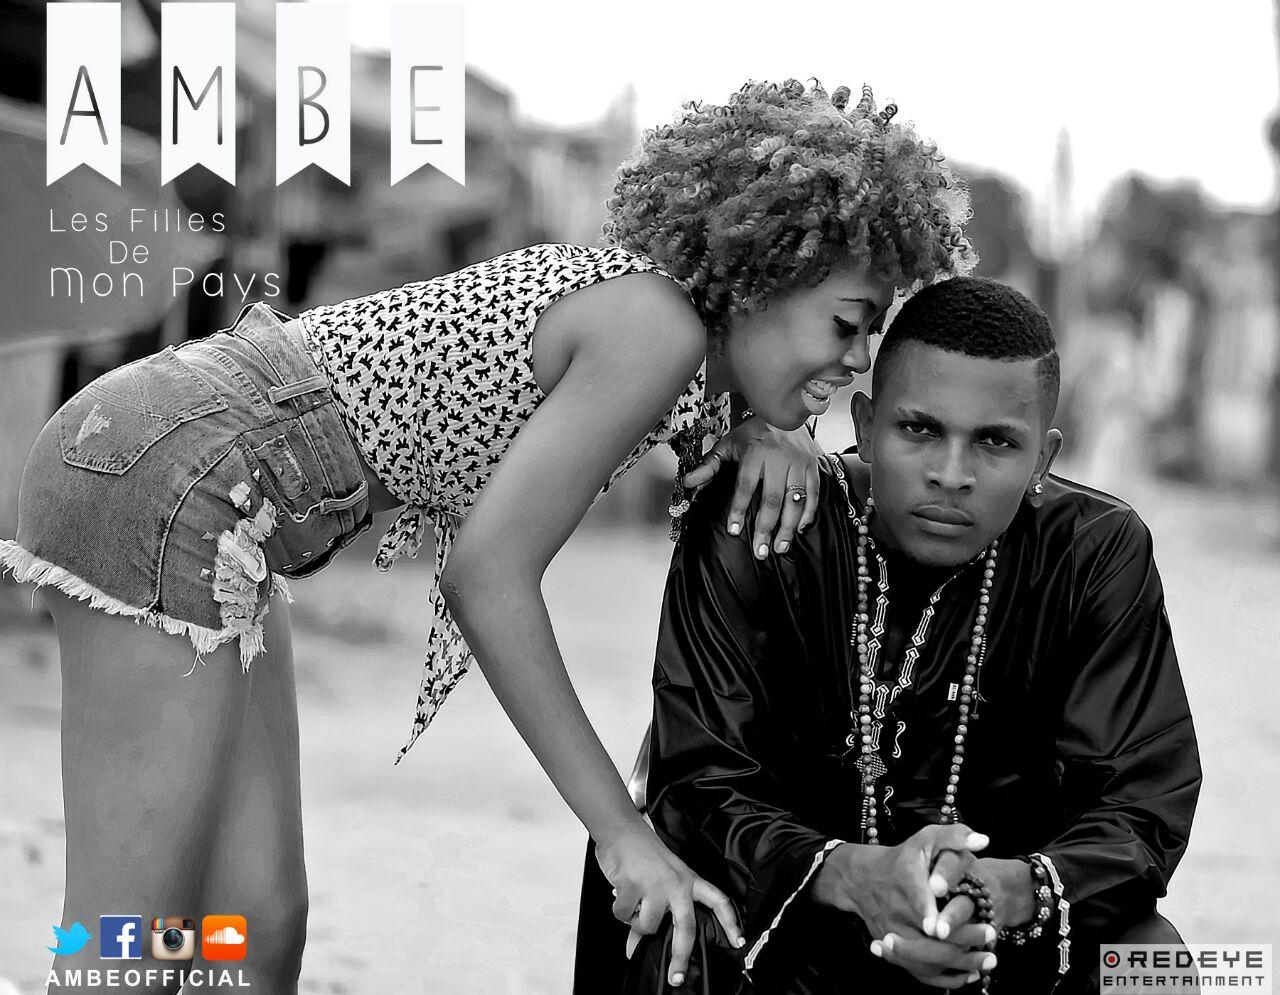 VIDEO: AMBE - Les Filles de Mon Pays - Latest Naija Nigerian Music, Songs & Video